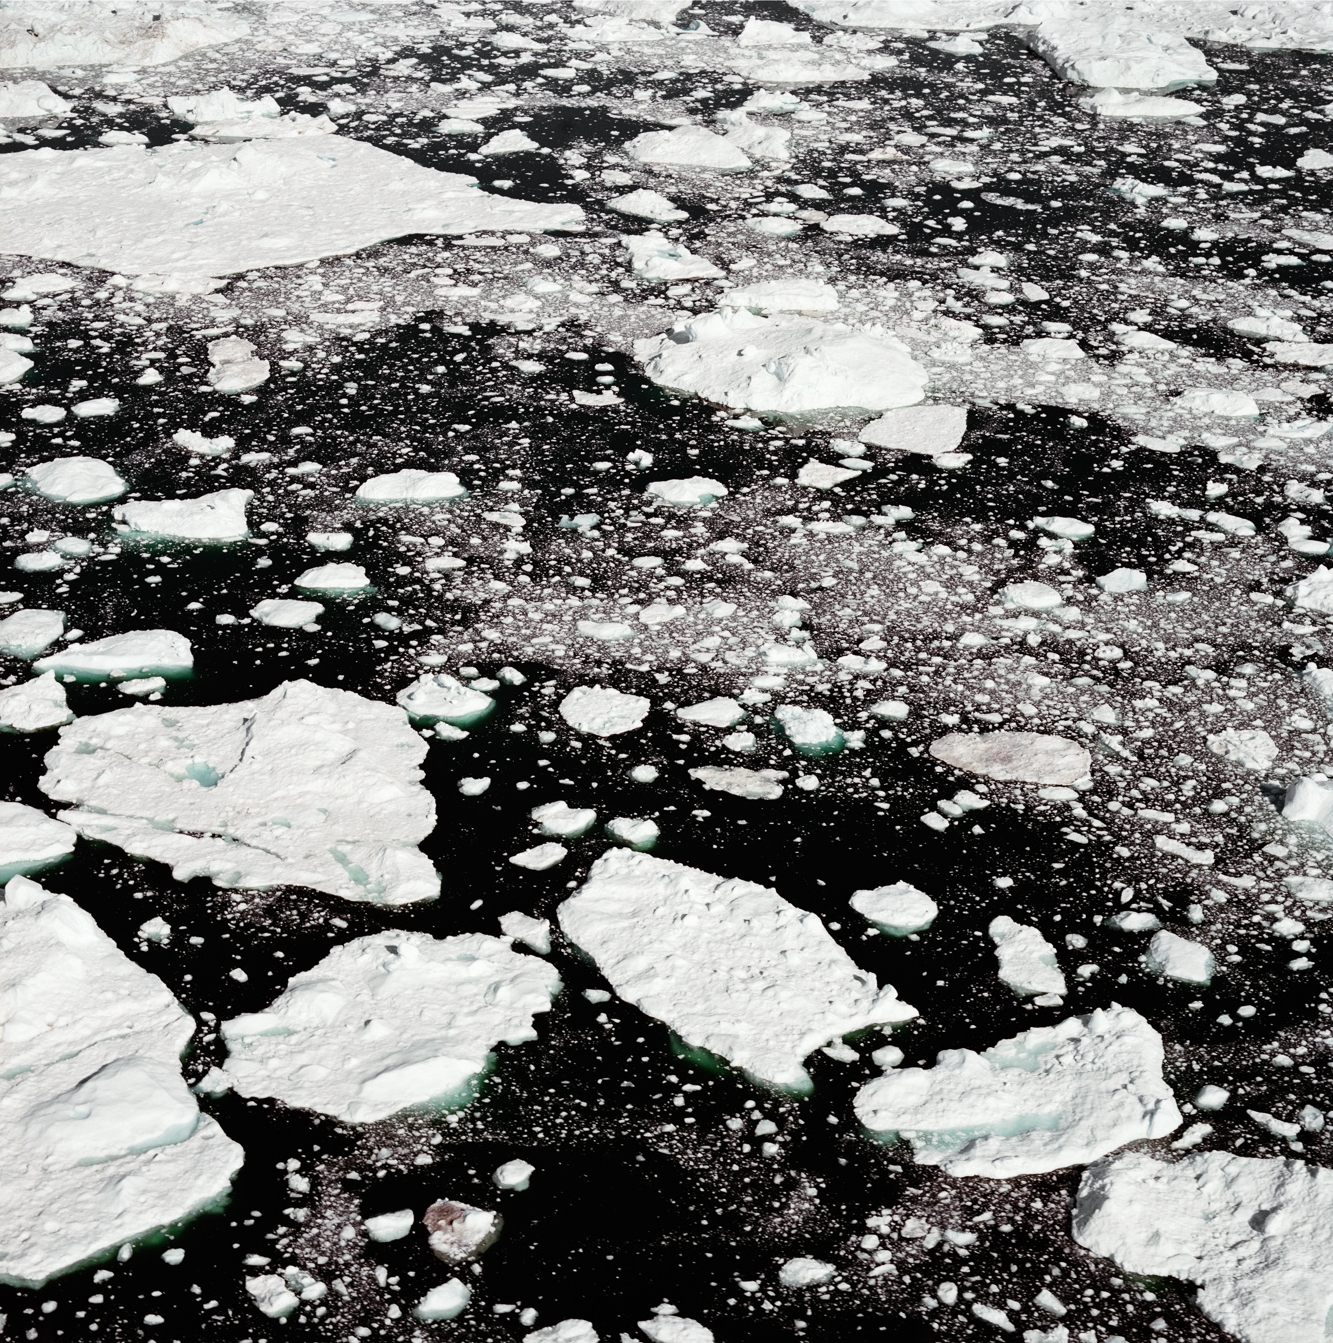 ice fjord2-sharp-80-print.jpg